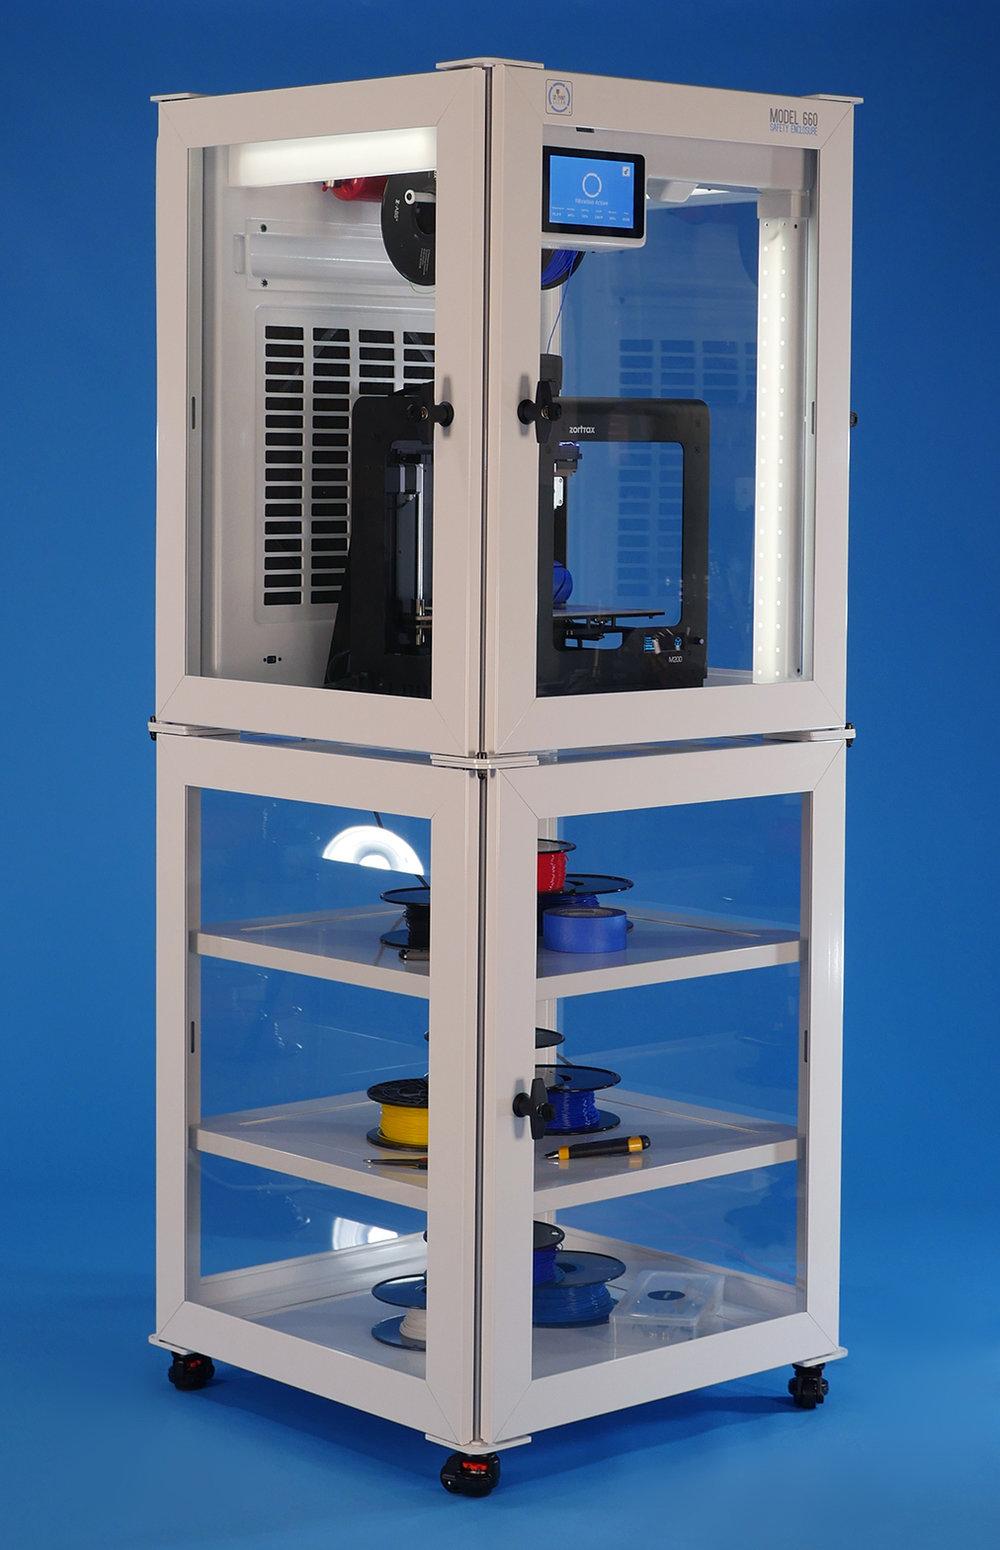 Printer, filaments, castors, spool holder, and fire suppression sold separatley